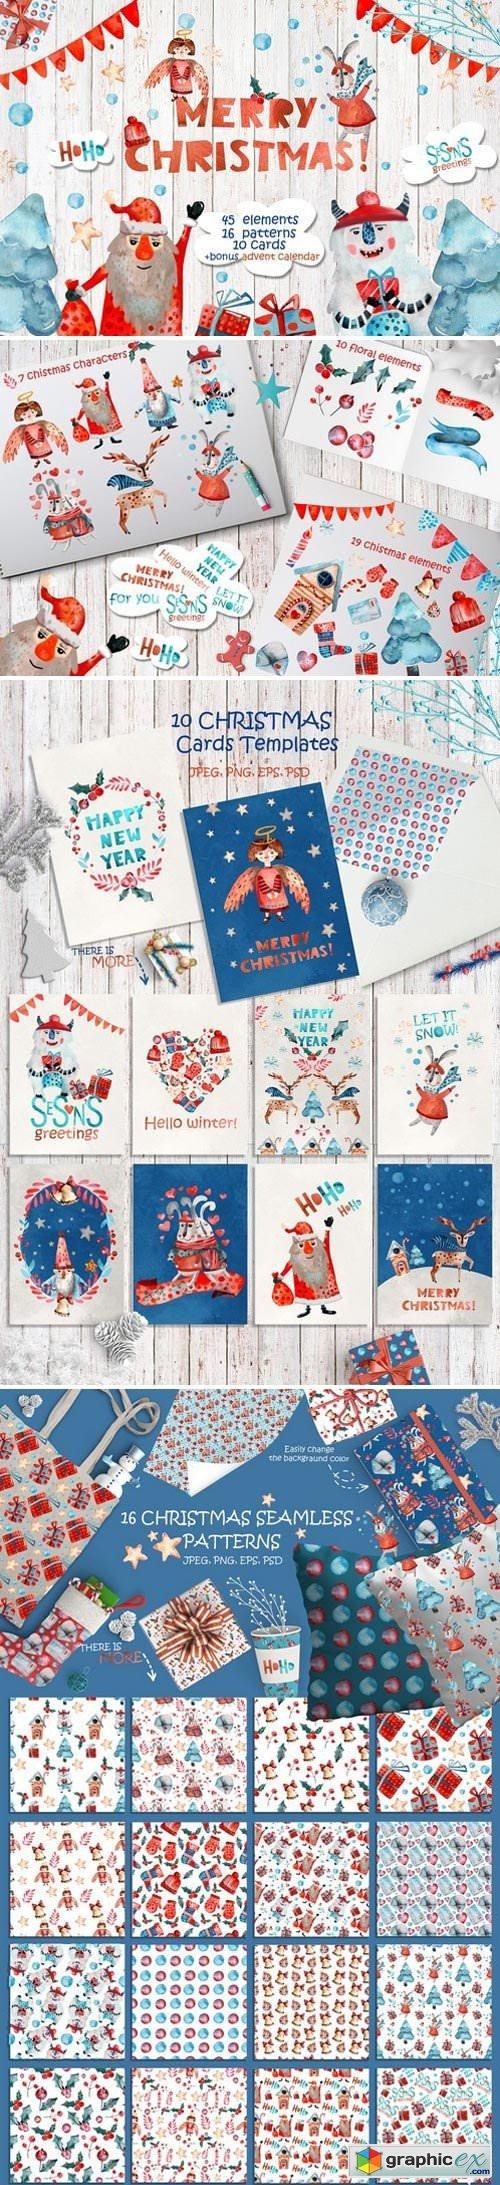 MerryChristmas| Bonus AdventCalendar